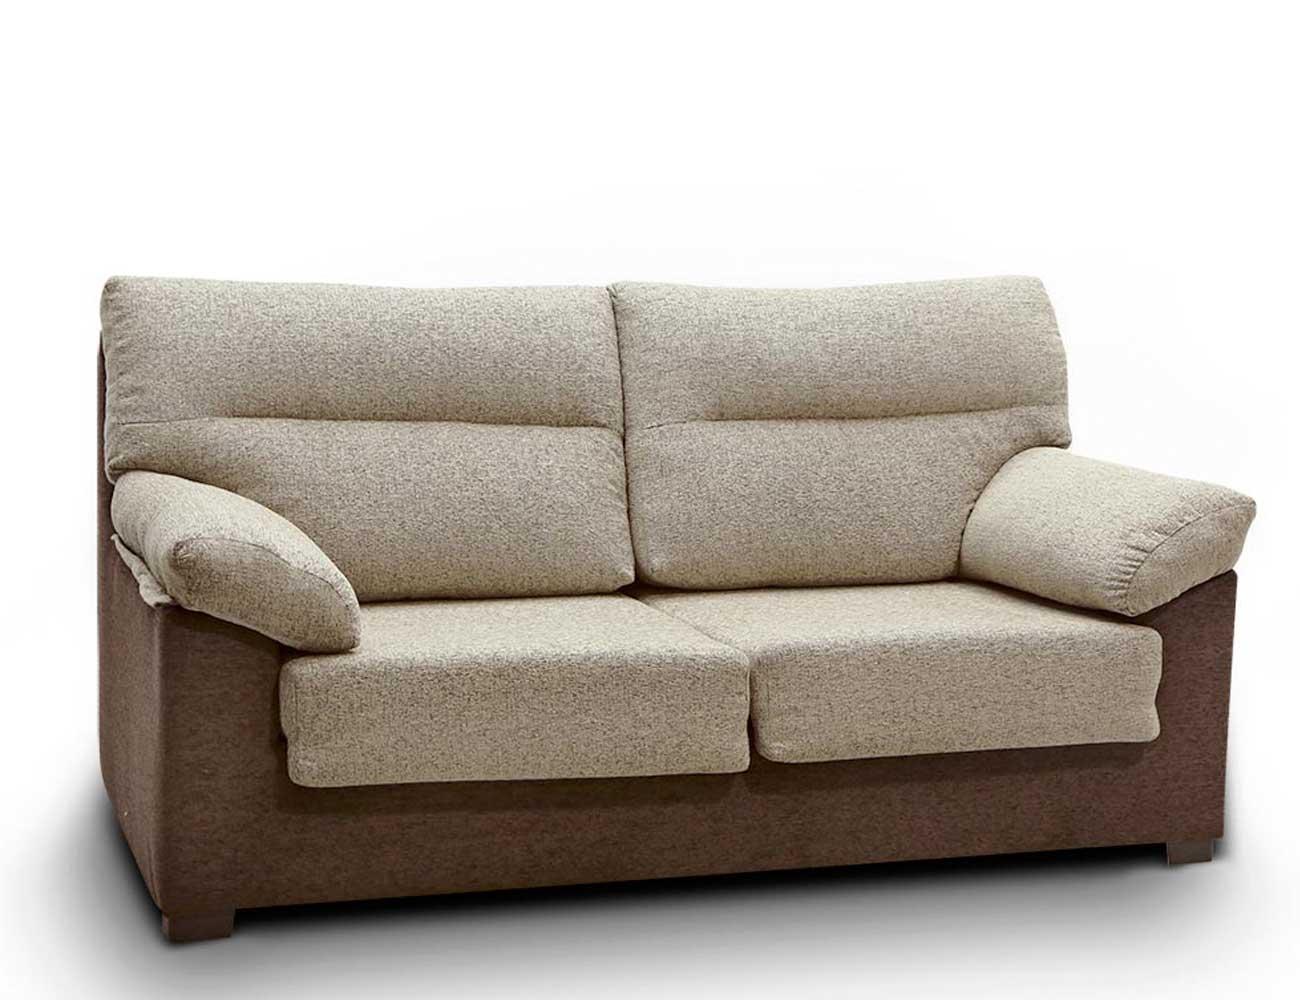 Sofa 3 plazas barato1